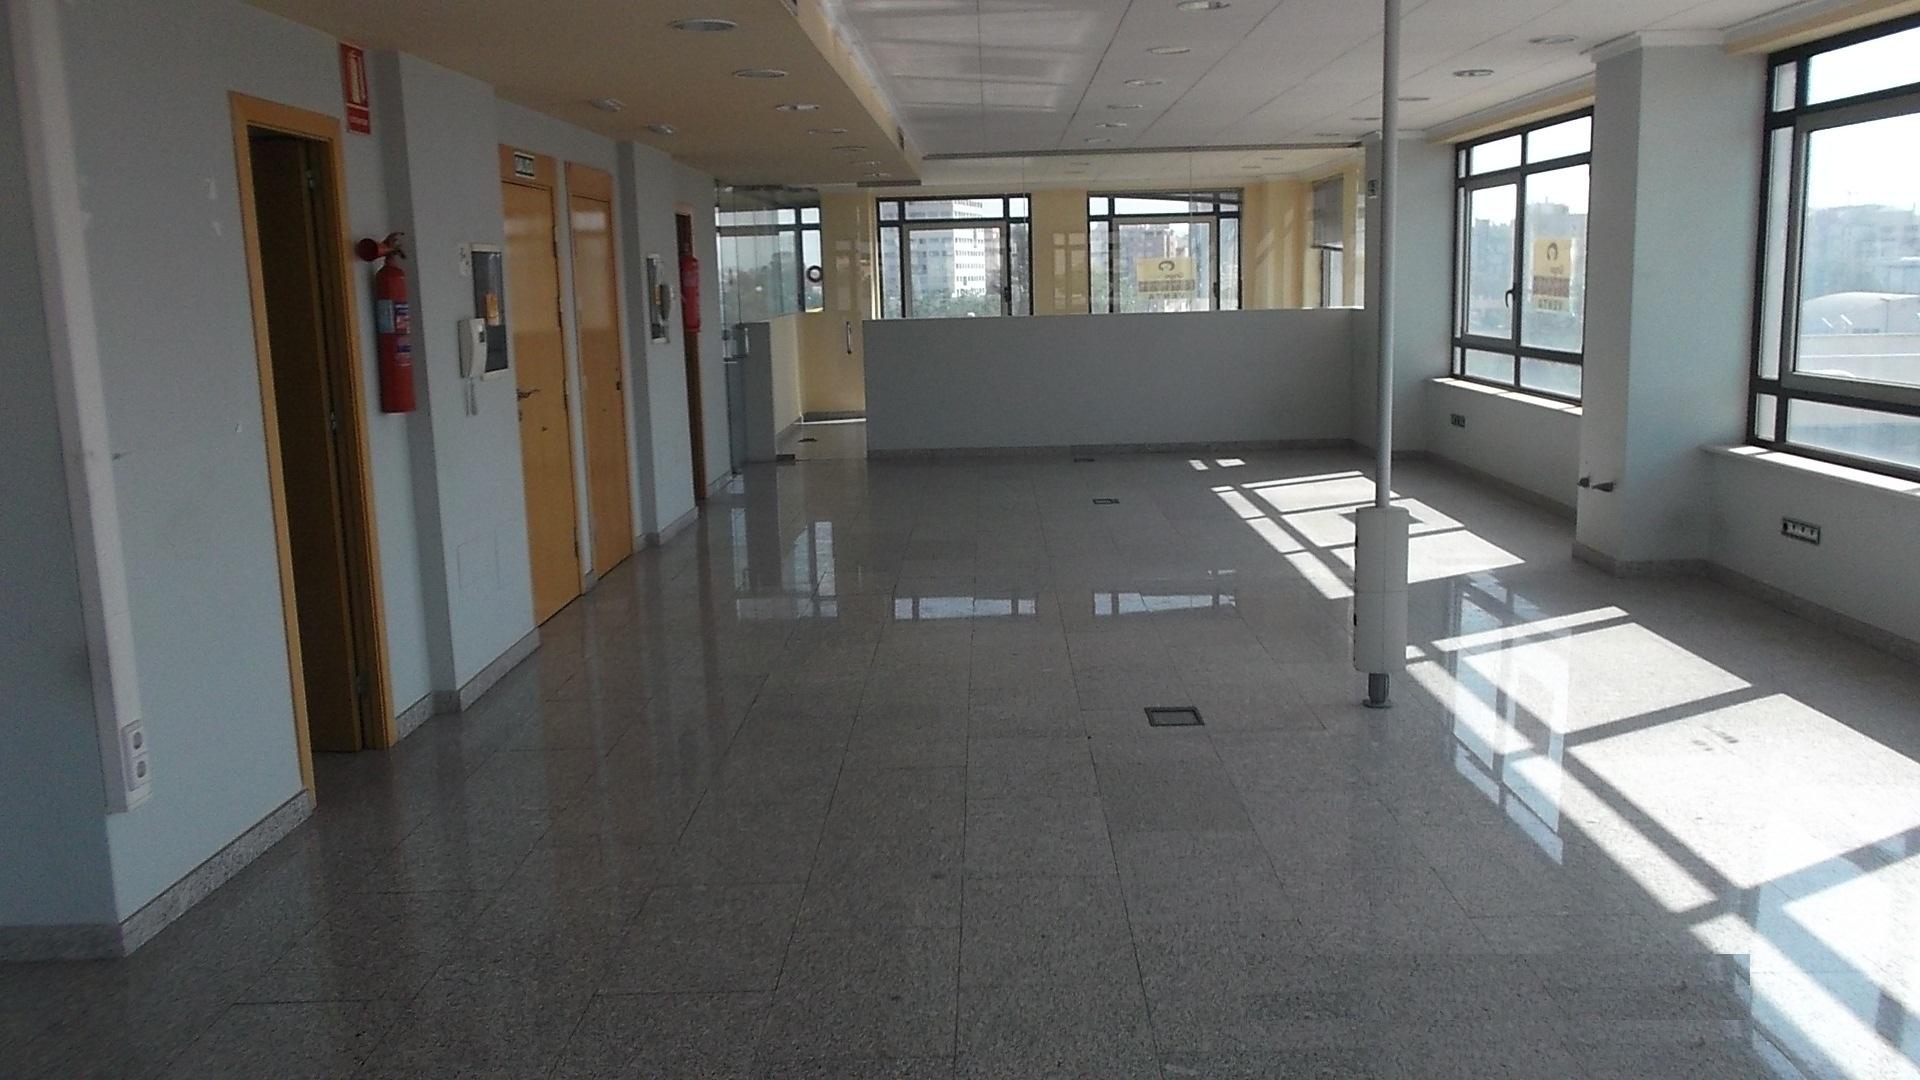 Oficina en Murcia (M79546) - foto4